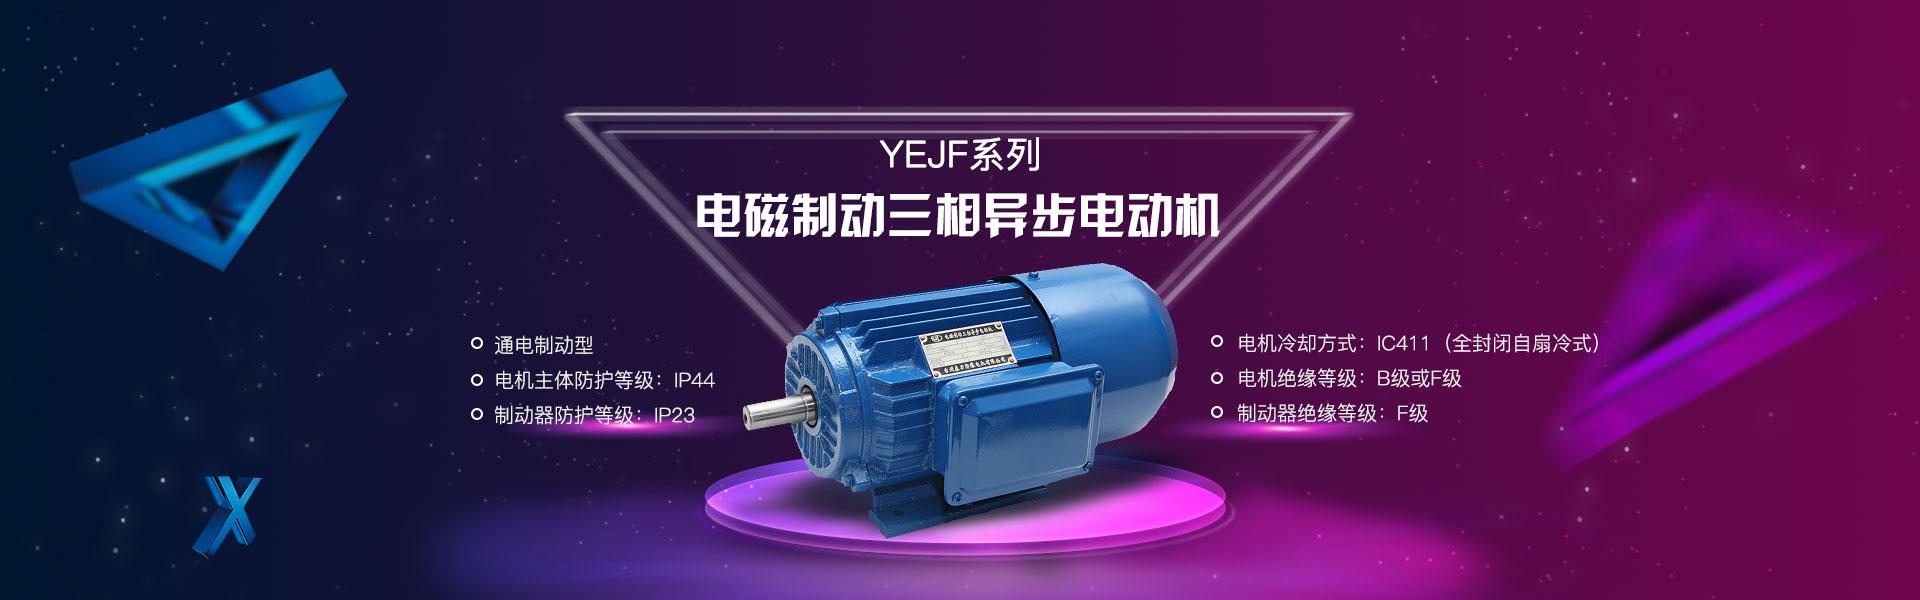 p-ygl-N4T022fQEOMlCPmQ.jpg